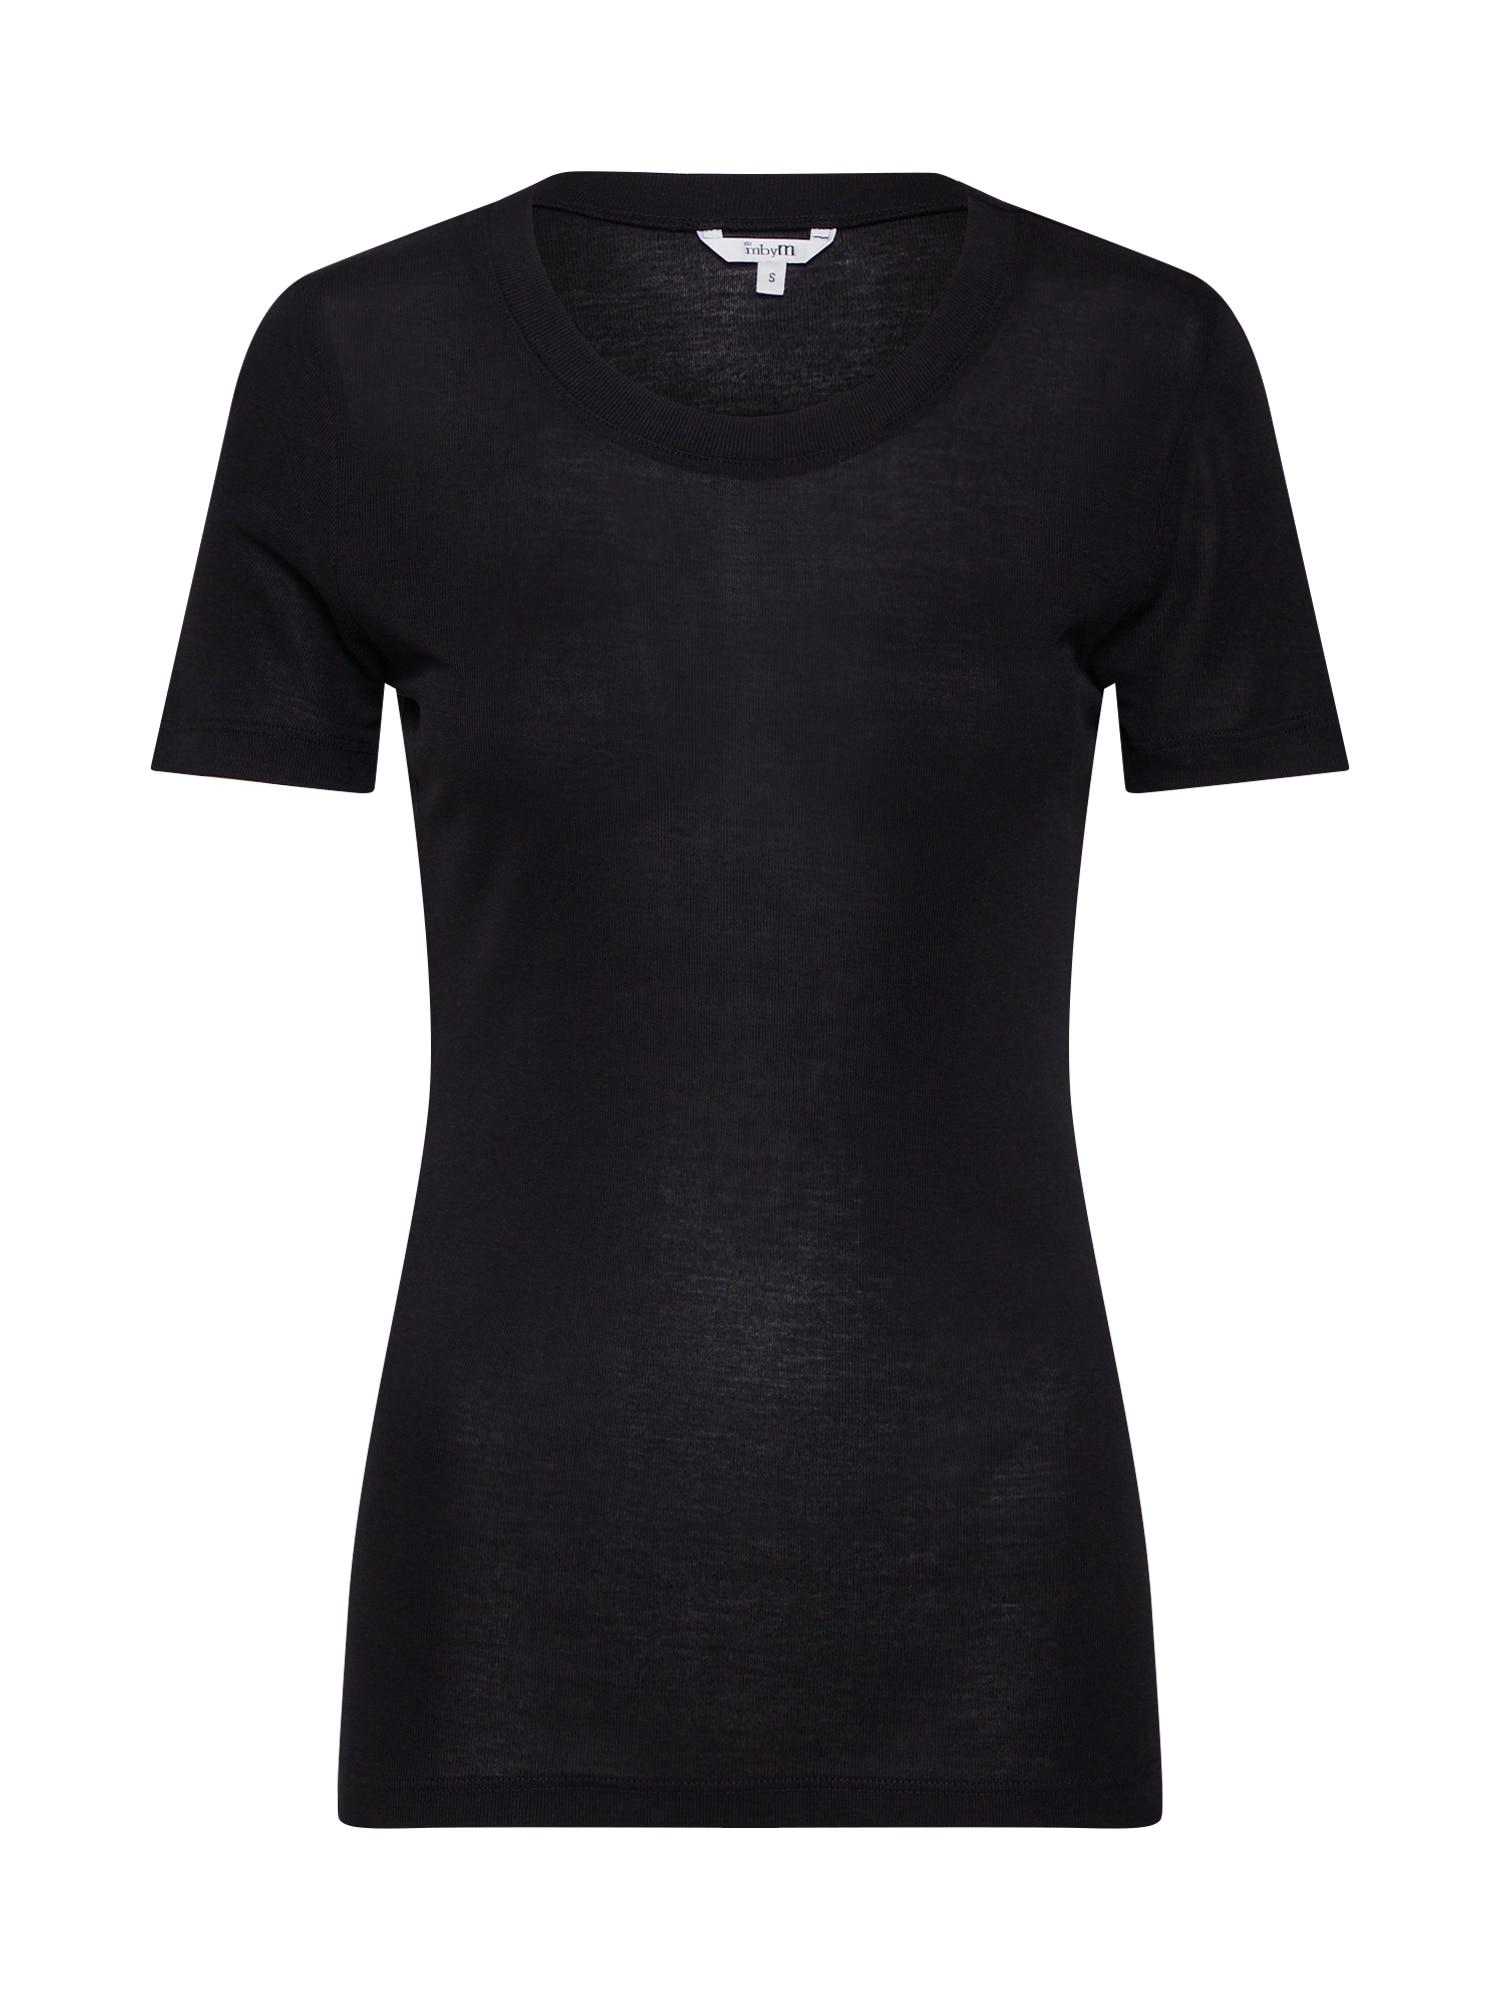 Tričko Samira černá Mbym